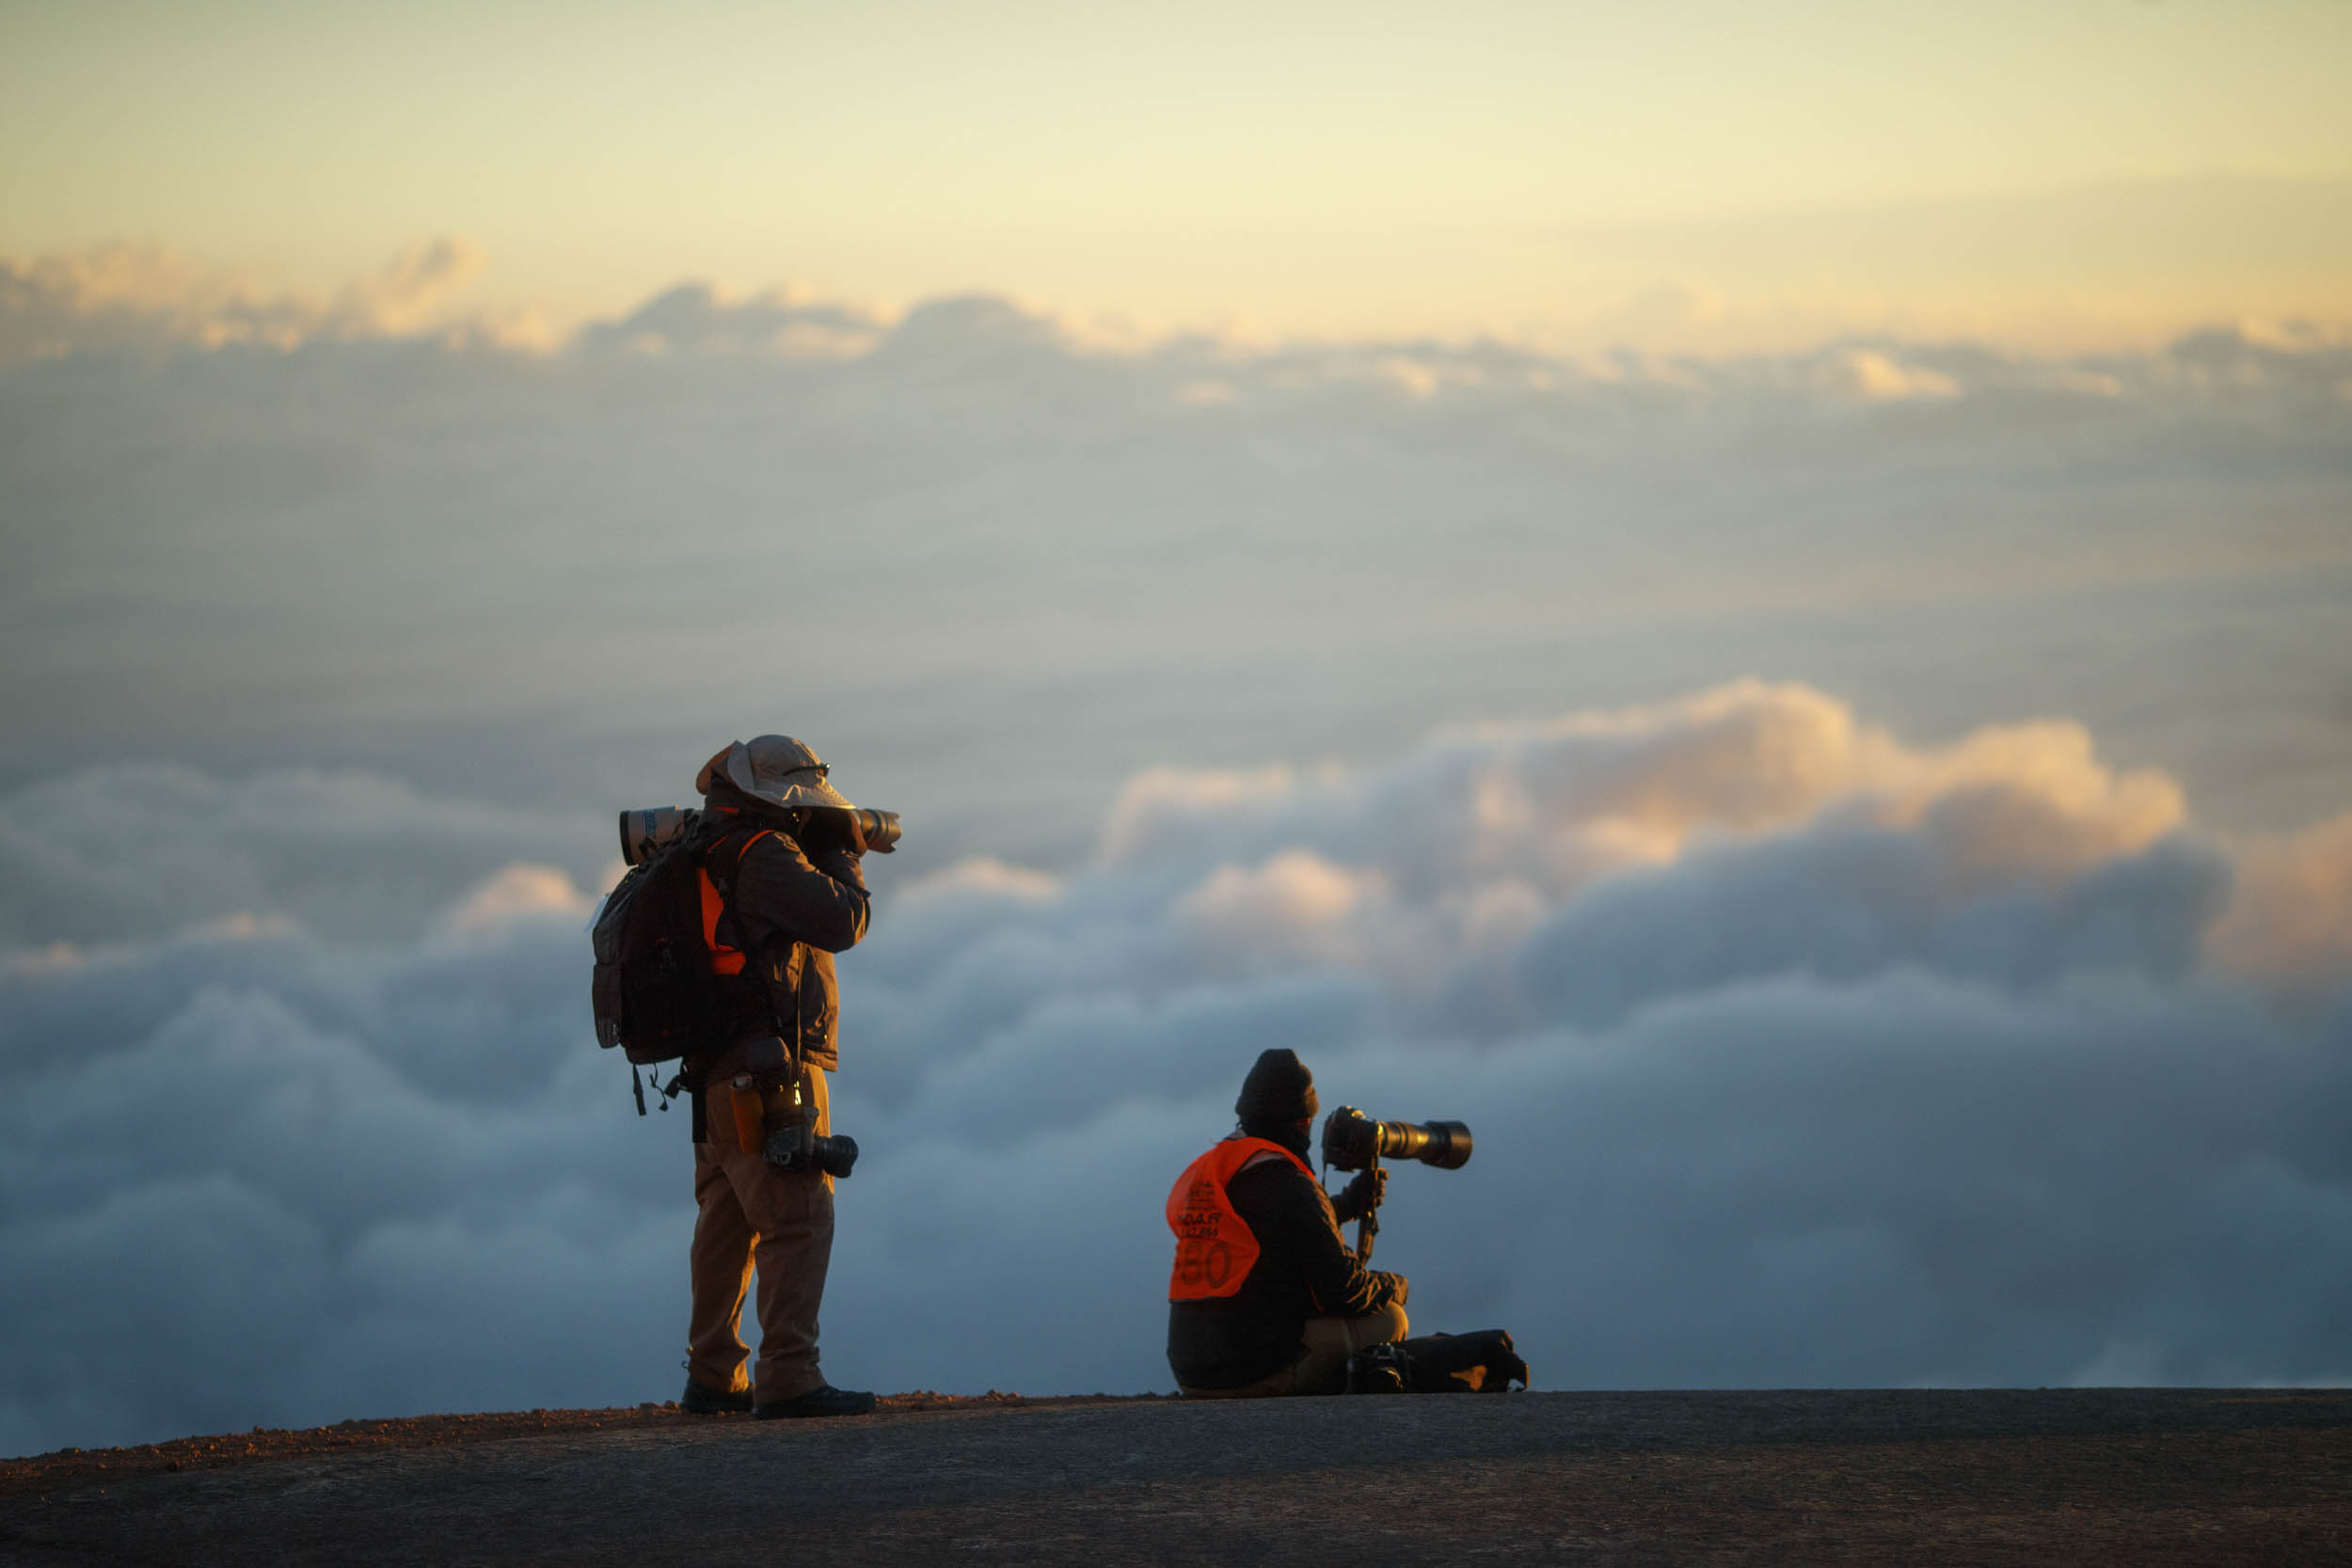 photographers shooting cars climbing Pikes Peak